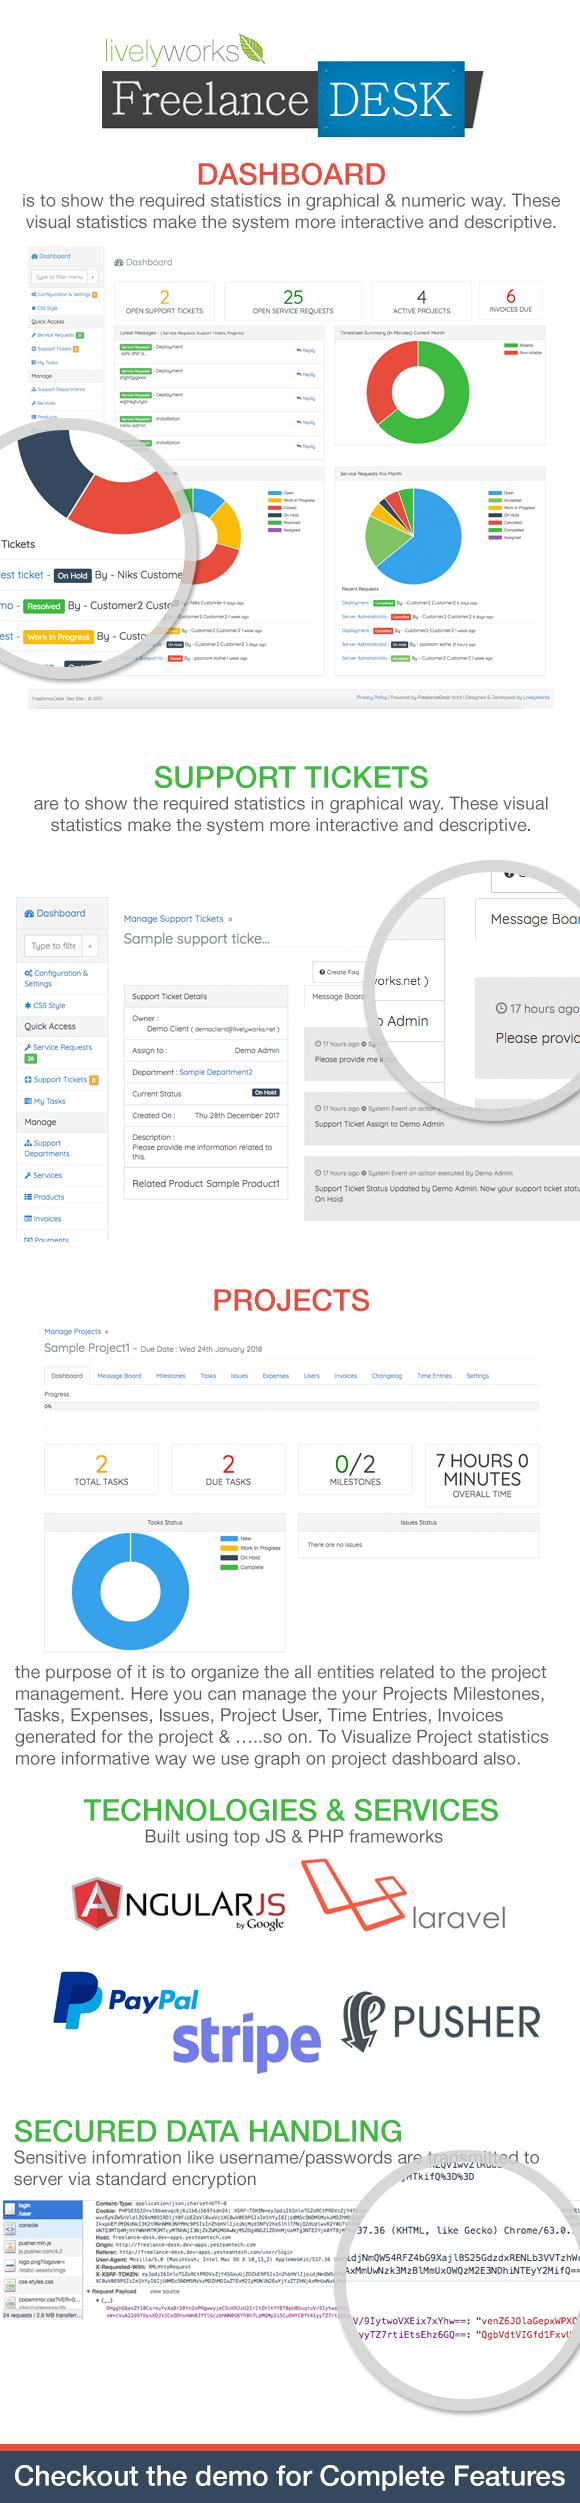 FreelanceDesk Features